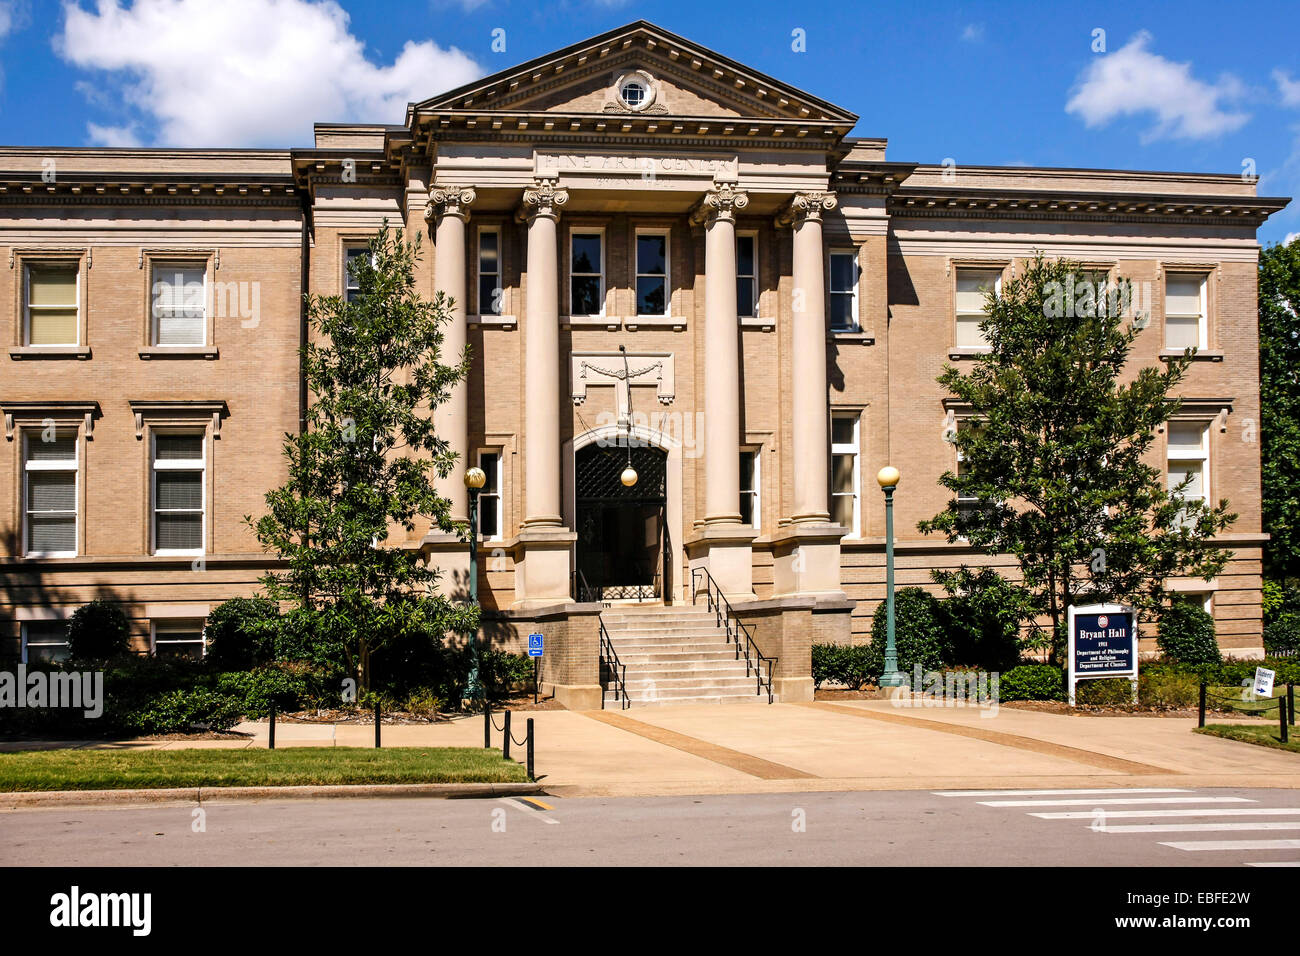 Bryant Hall - Fine Arts Center auf dem Campus der Ole Miss University of Mississippi in Oxford. Stockbild